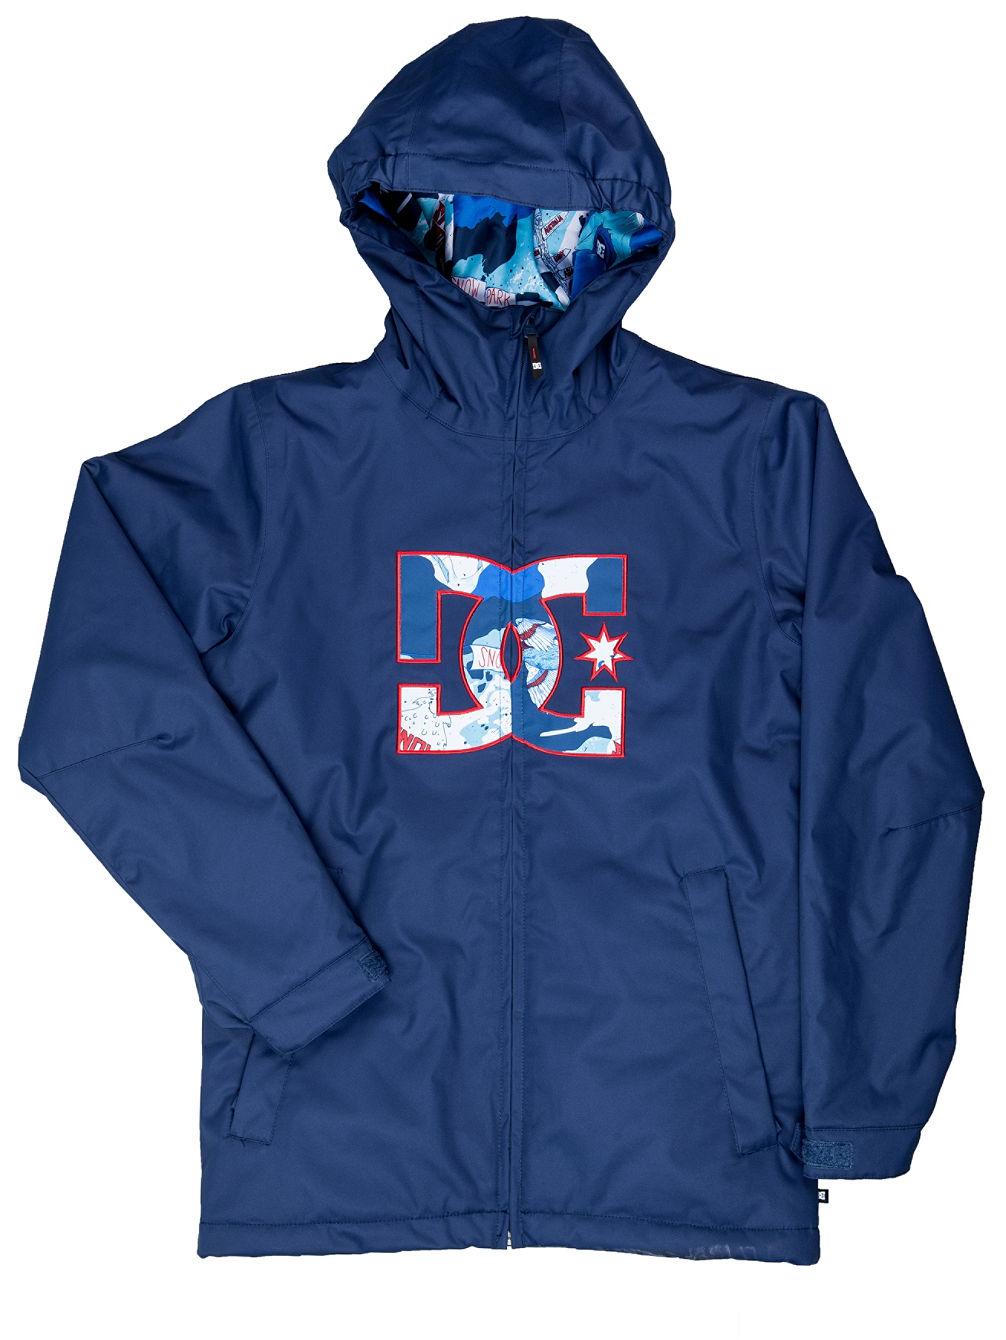 6df77d93b Buy DC Story Jacket Boys online at blue-tomato.com